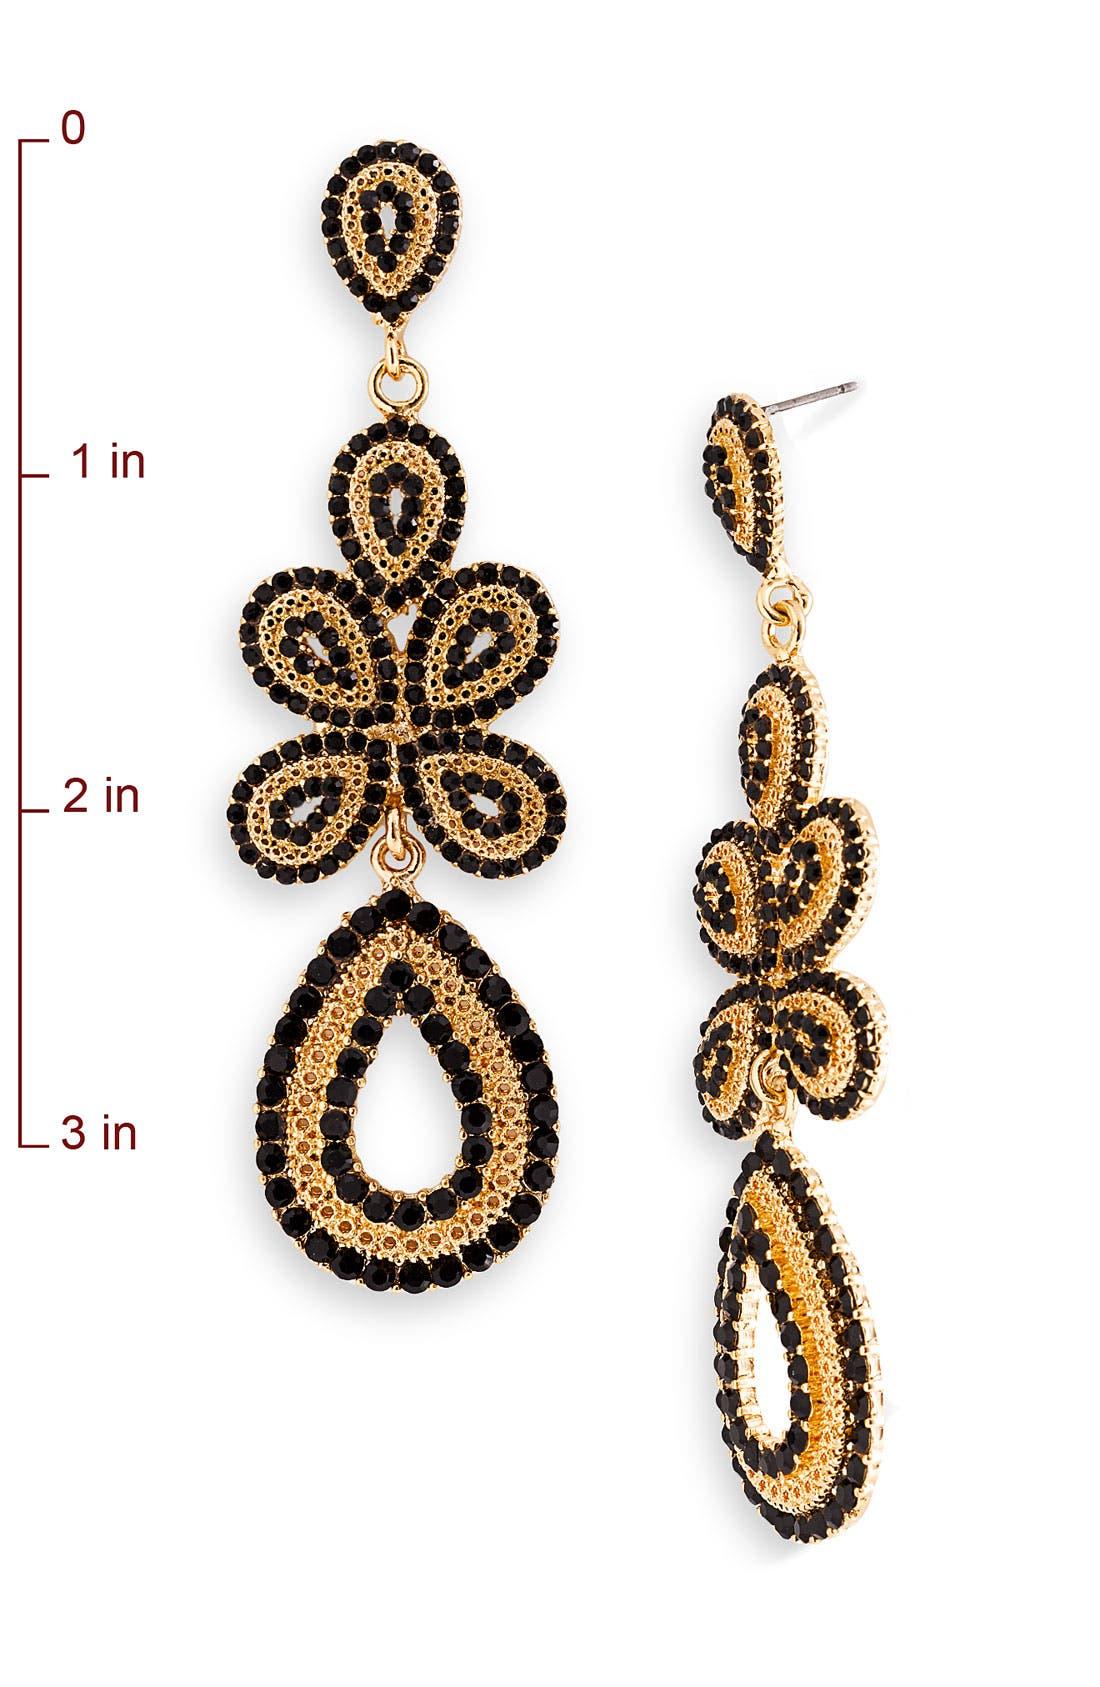 'Ornate' Linear Statement Earrings,                             Alternate thumbnail 2, color,                             001